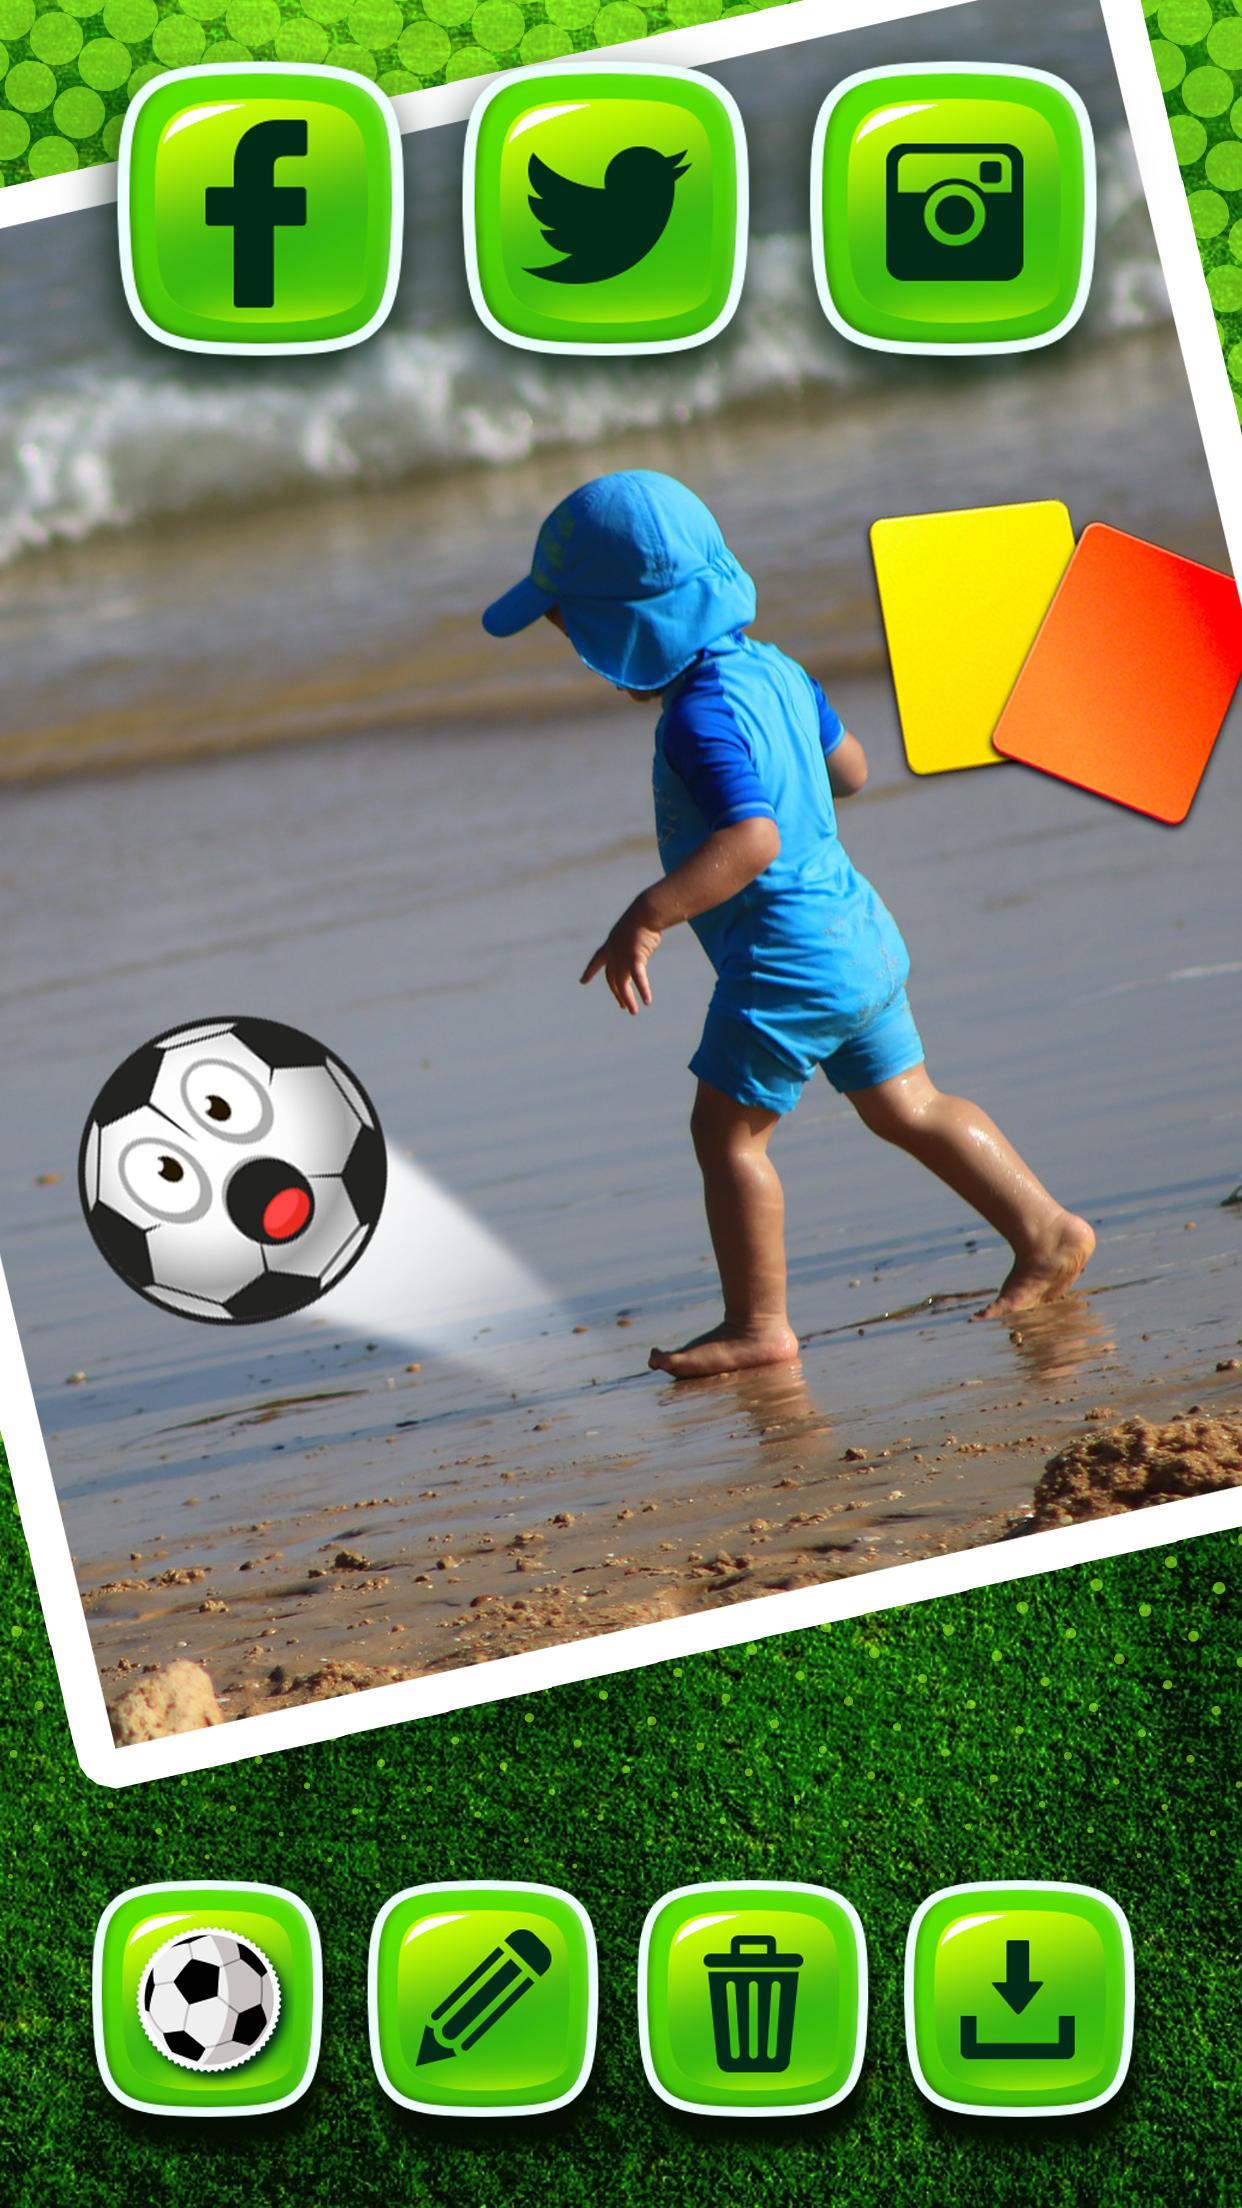 Trikot Gestalten Fussball Fur Android Apk Herunterladen